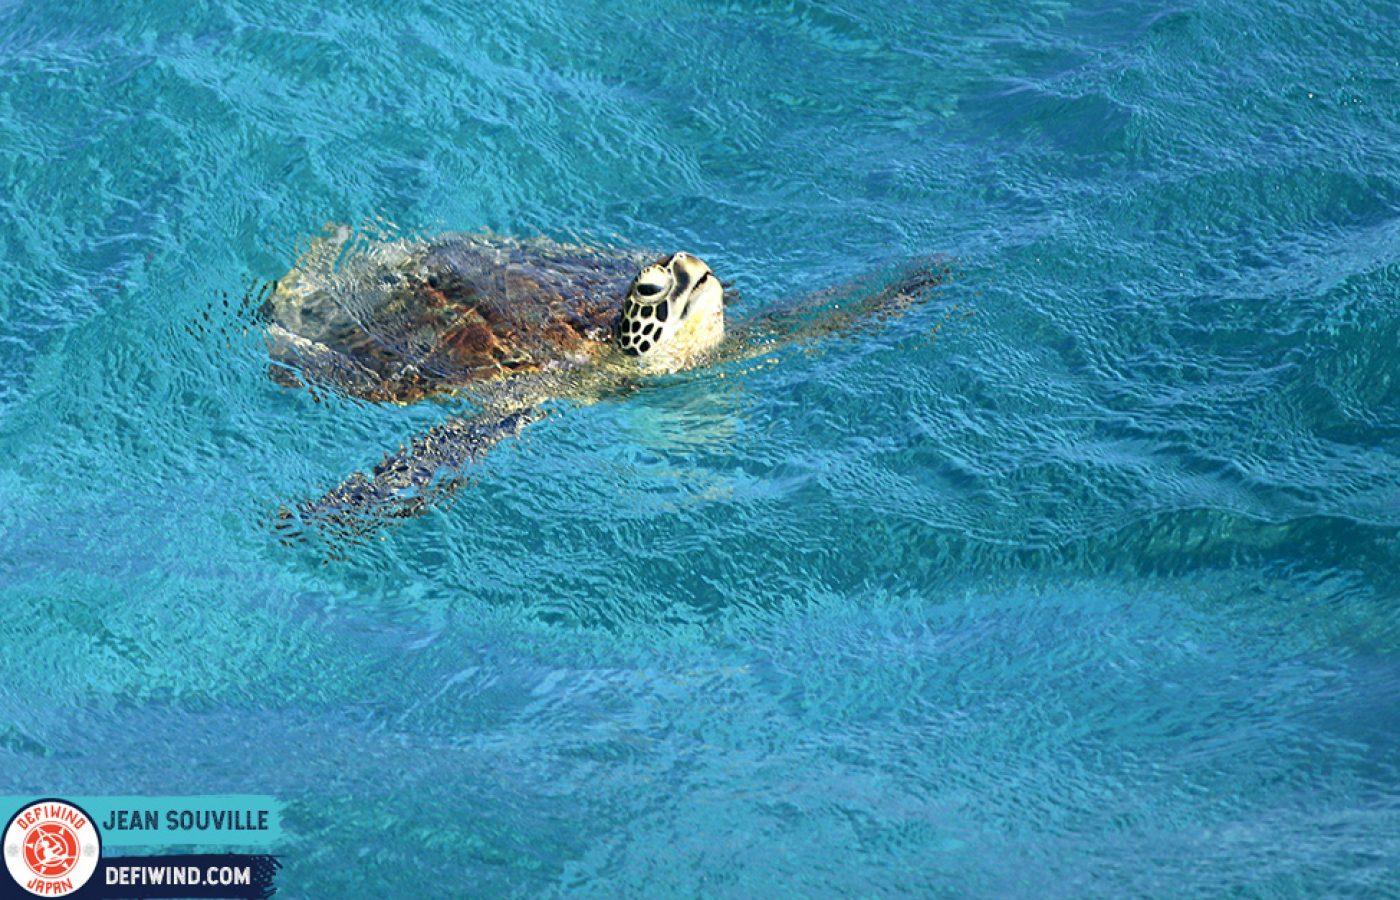 turtle-races-1-2-defijapan-miyako-souville (198)small